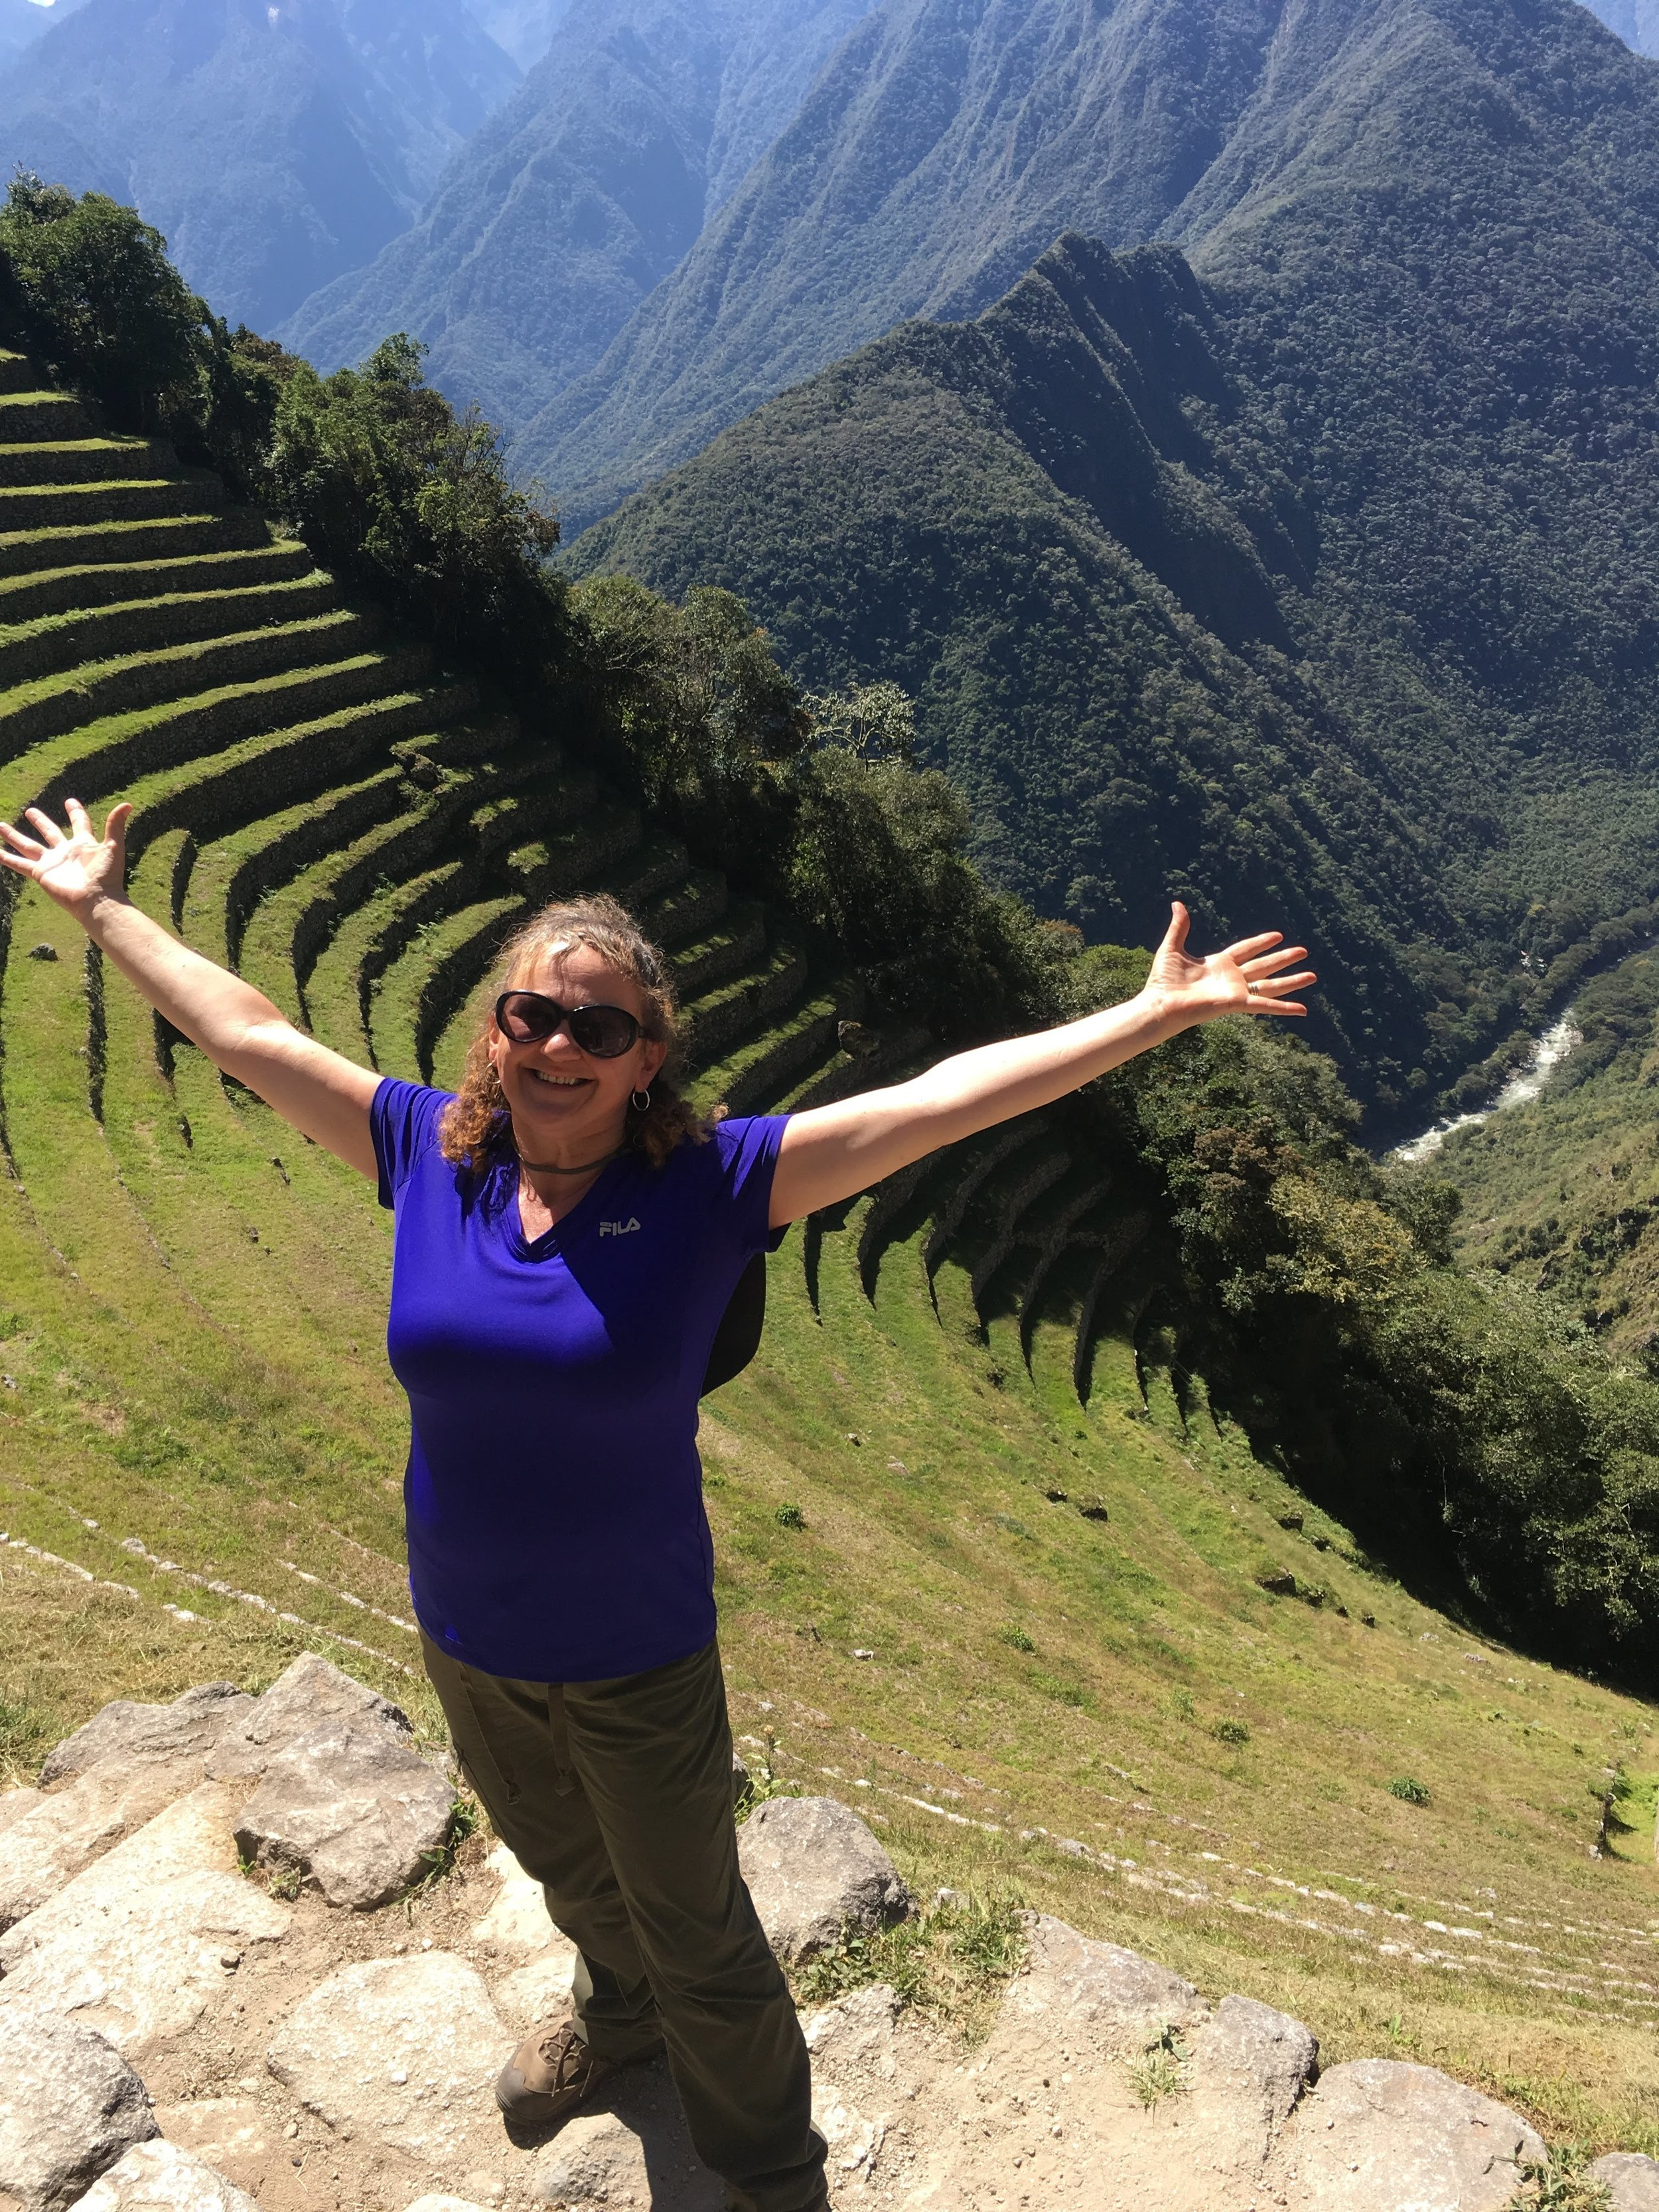 Deep breath of joy at Winay Wayna, Inca Trail, Peru.